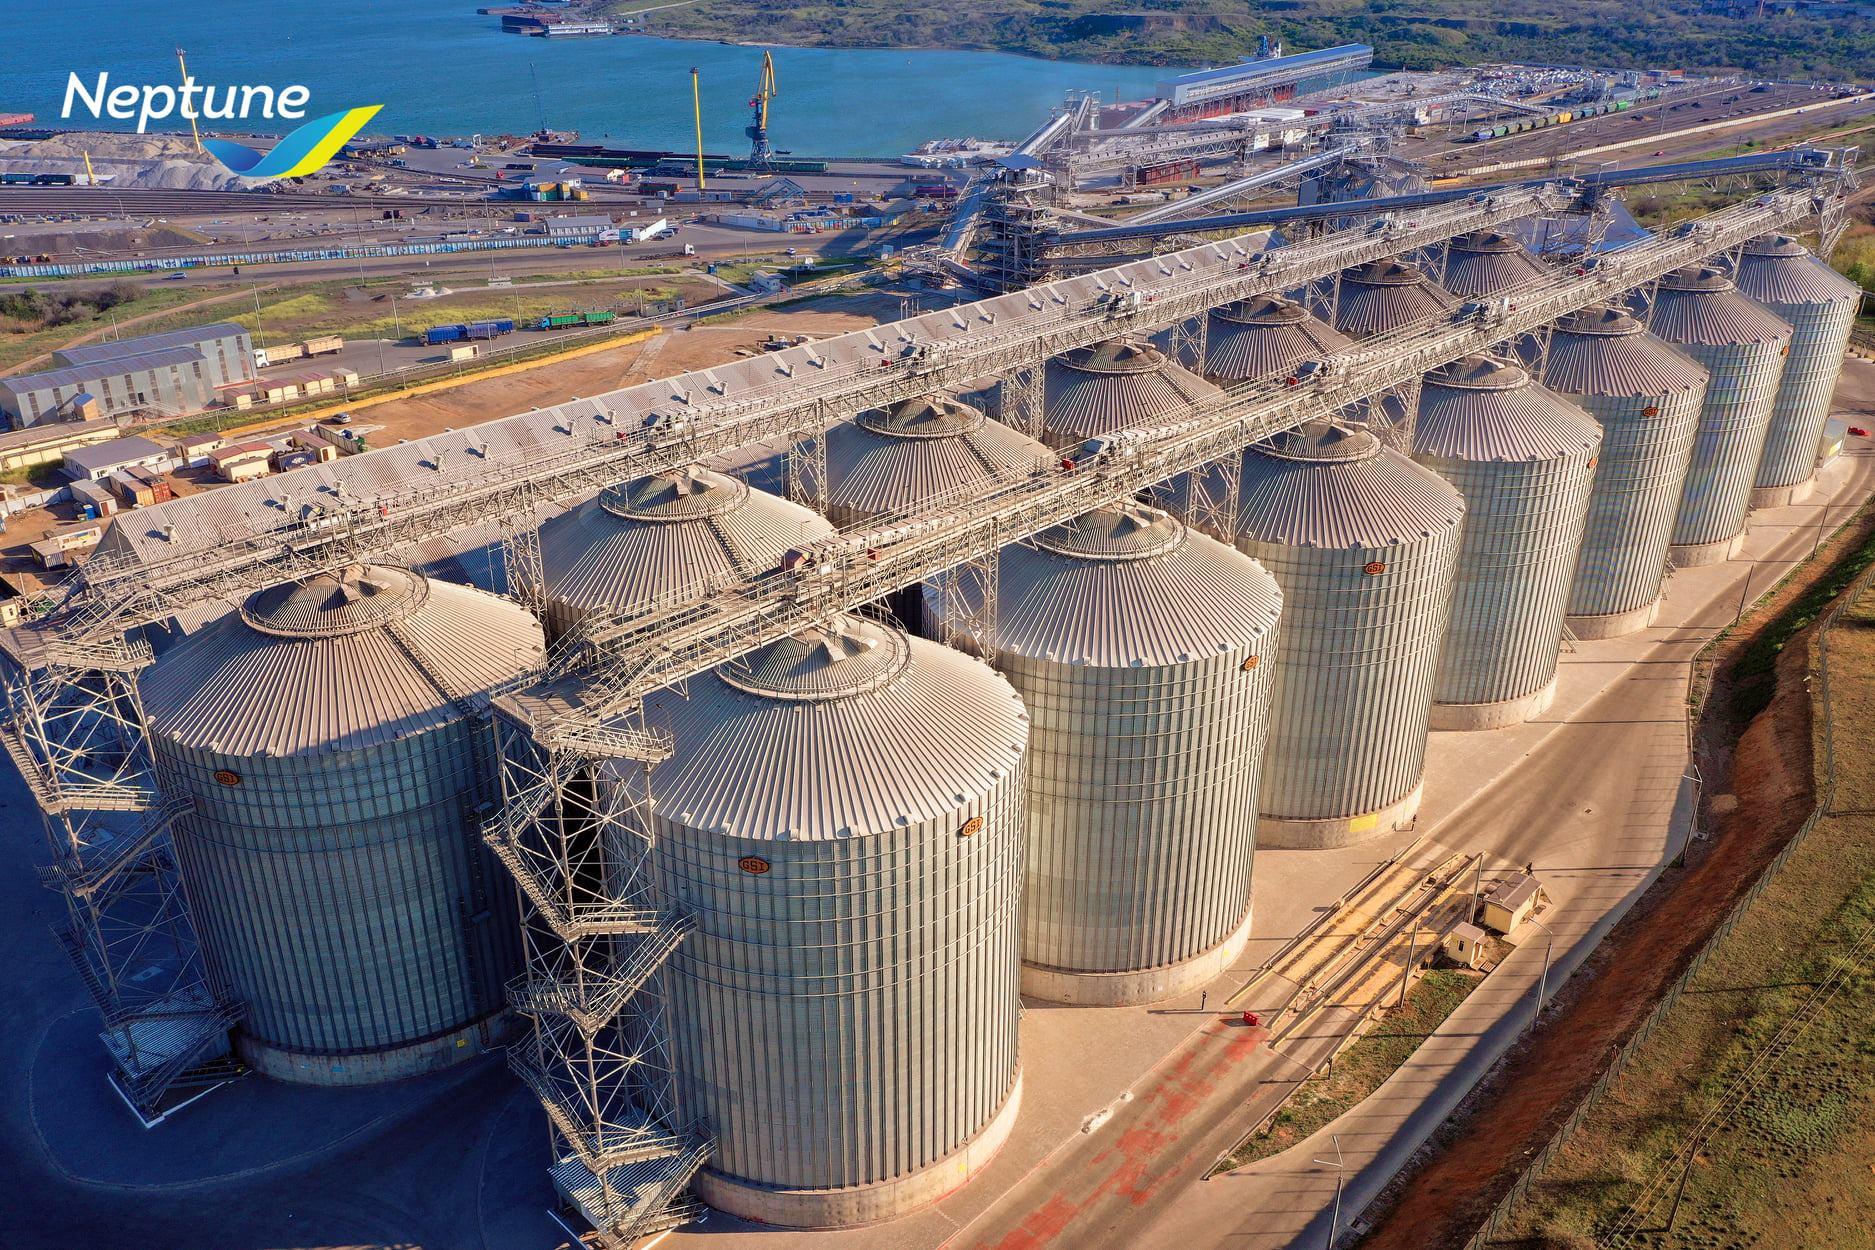 Neptune Grain Terminal in Pivdenny Port, Odesa region (click for high resolution)